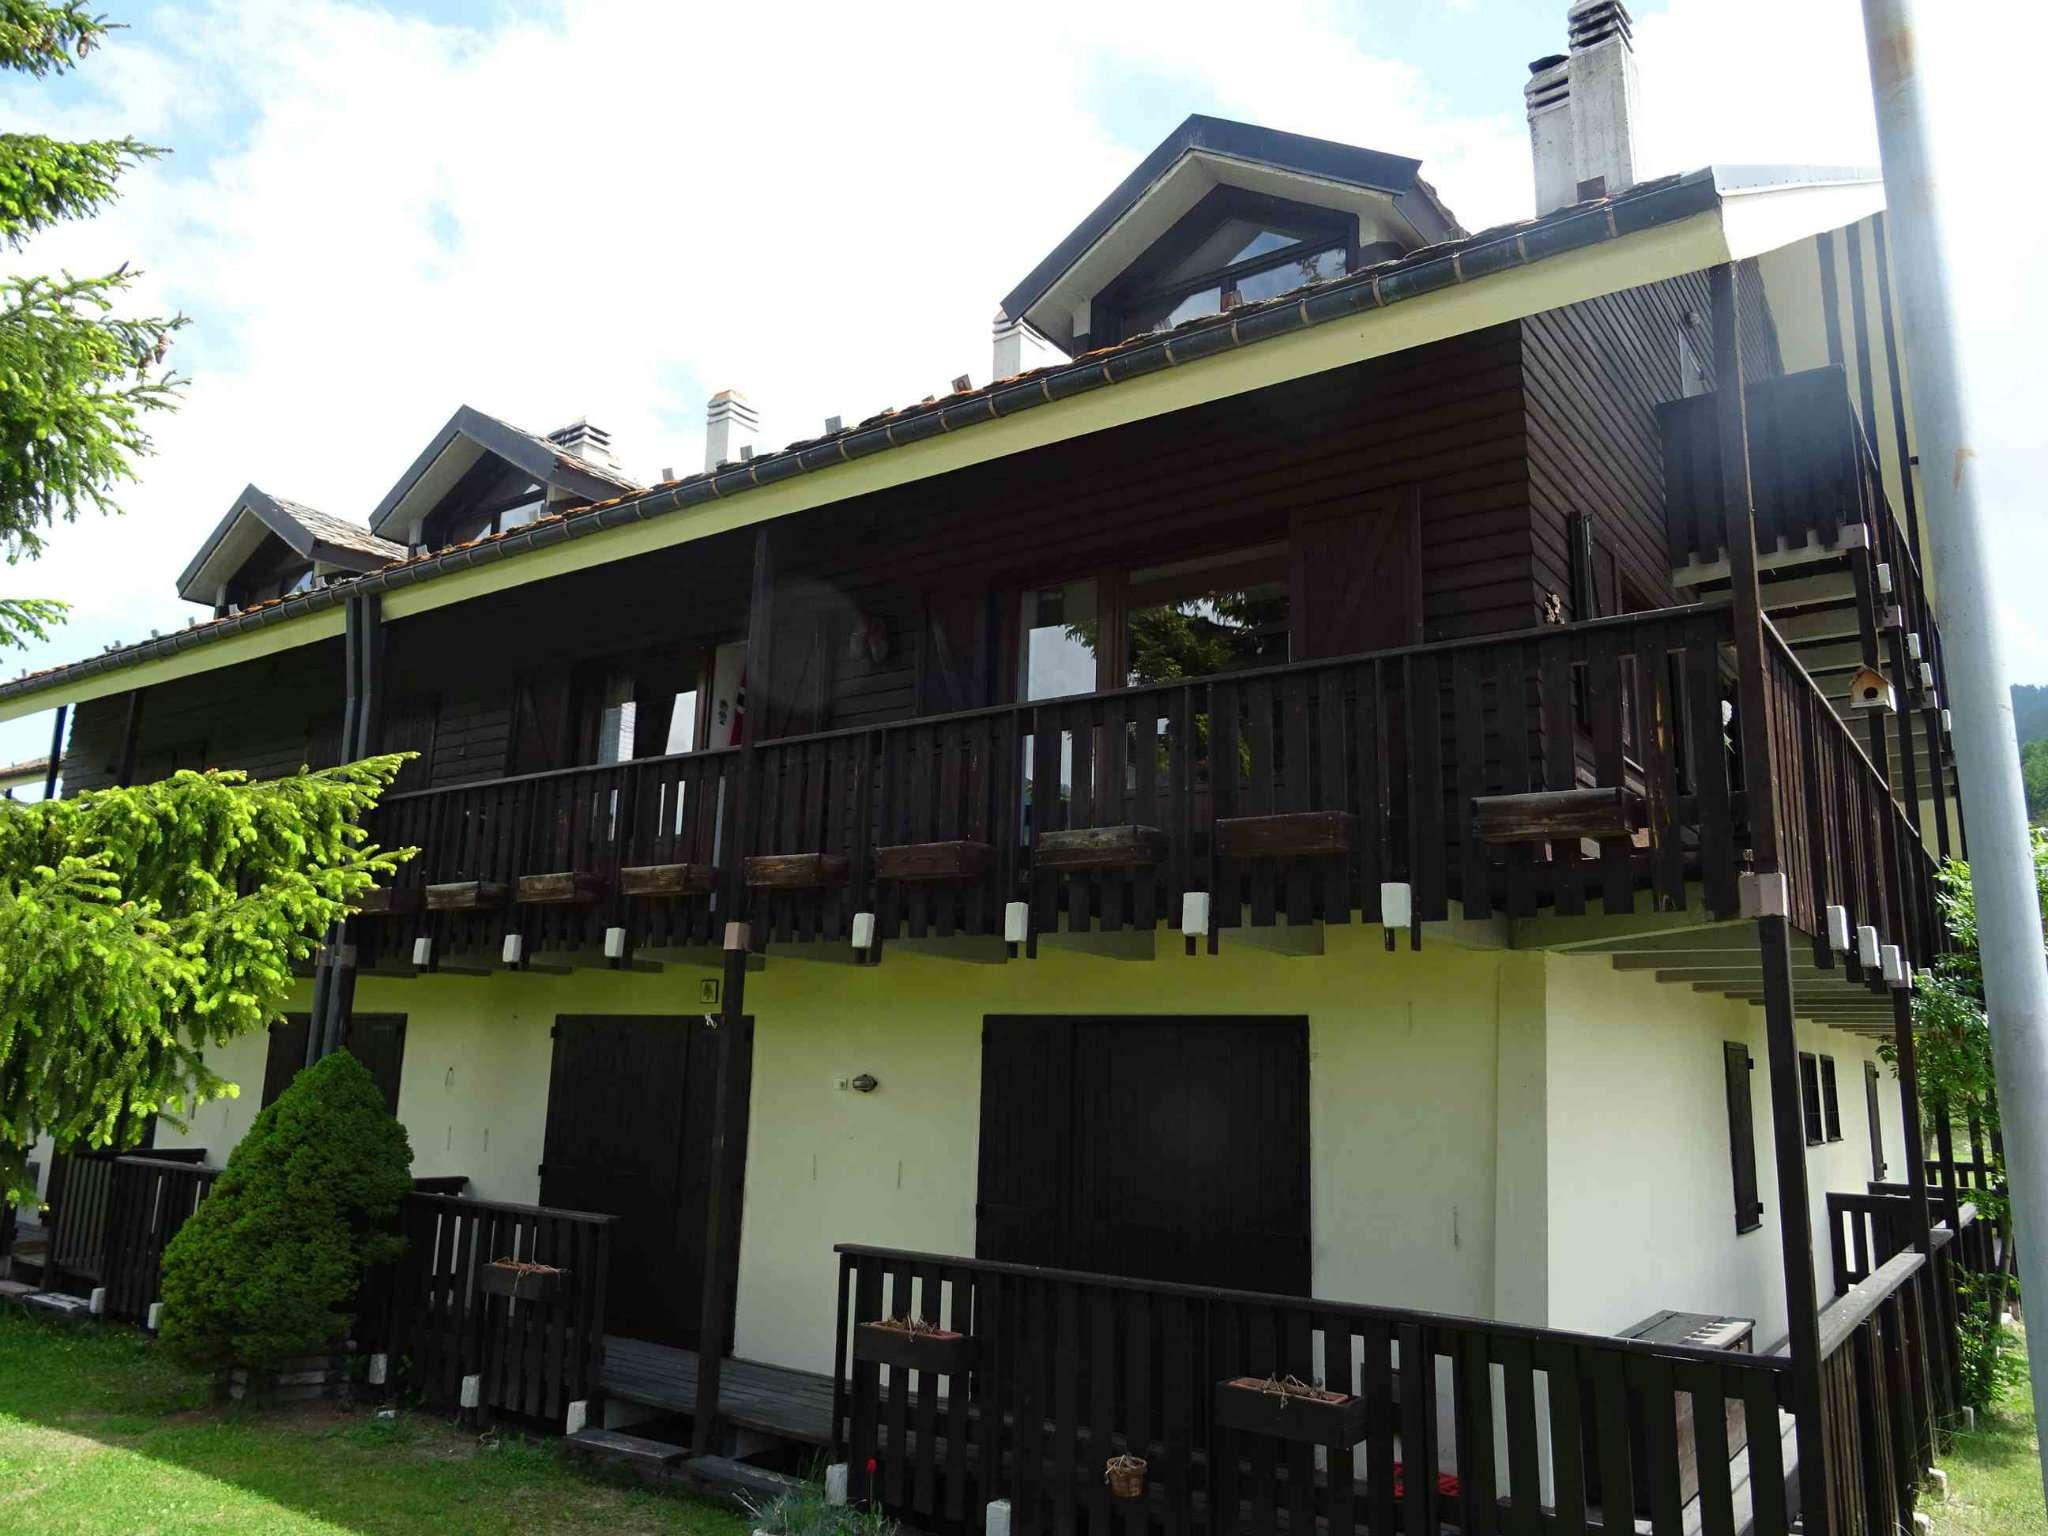 Casa vacanza in vendita borgata Mollieres Cesana Torinese